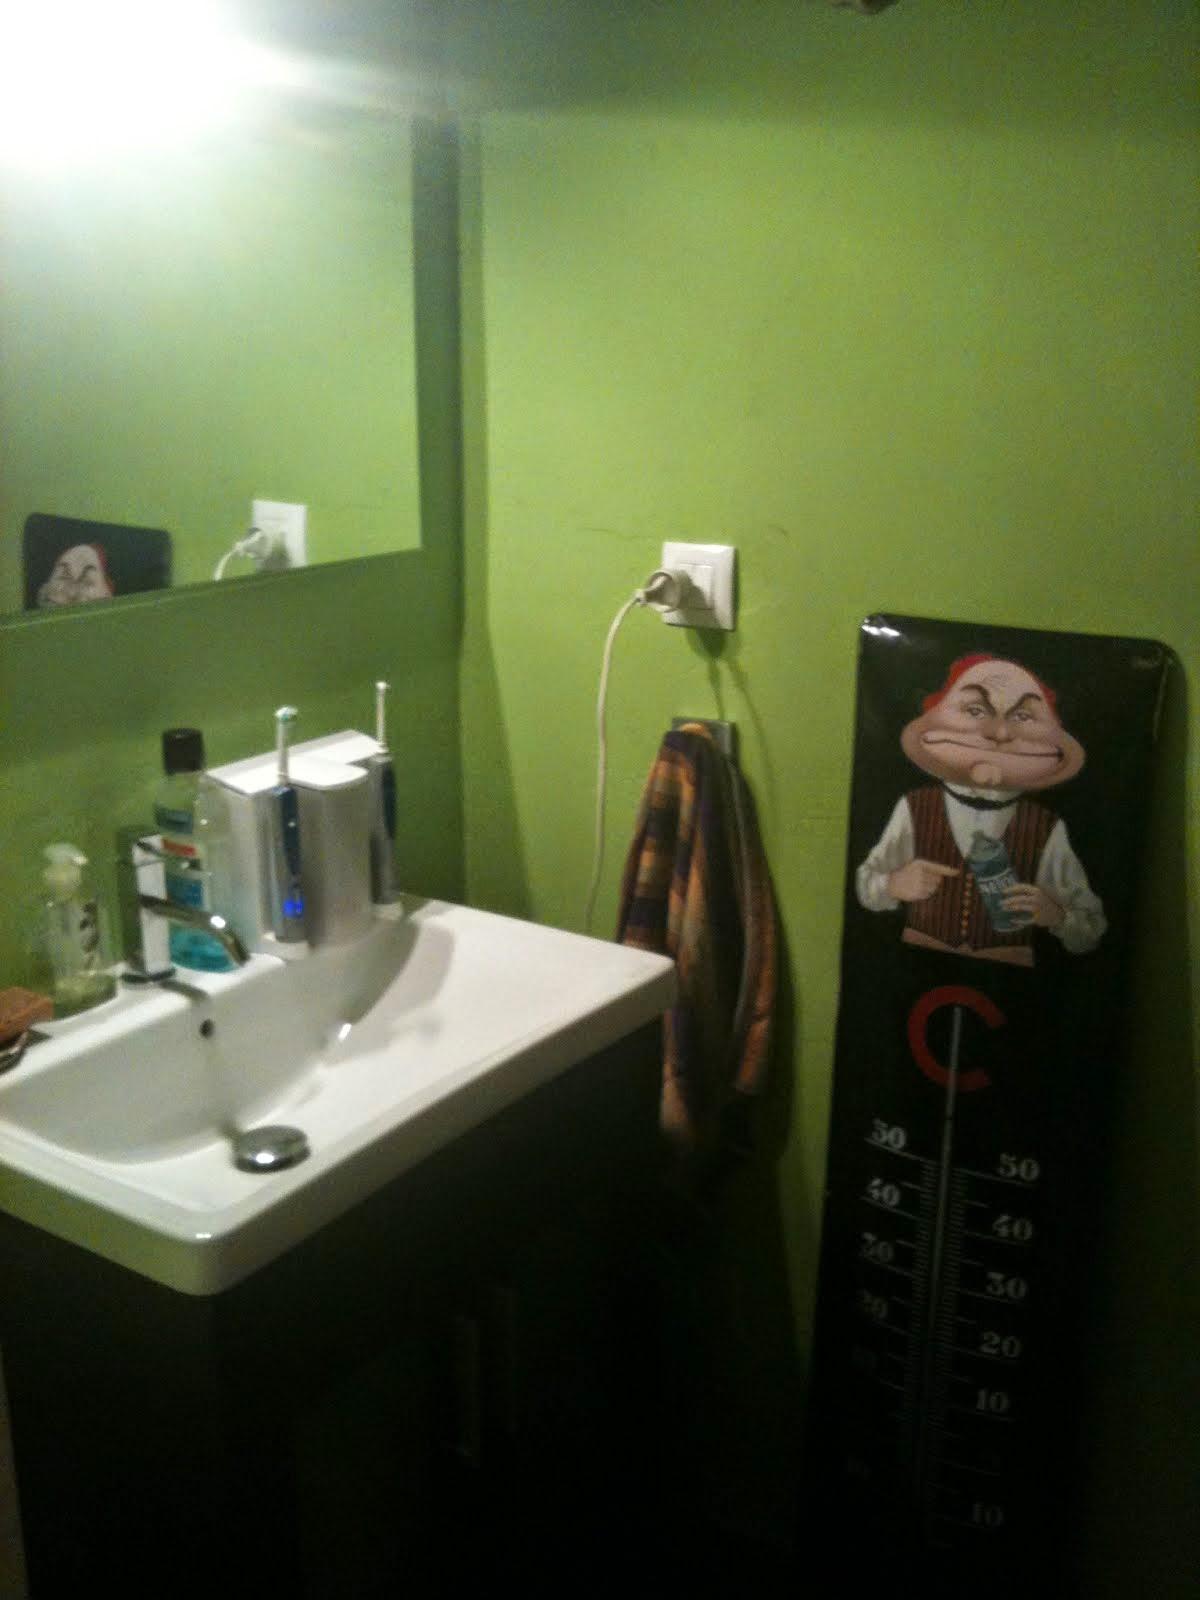 bany de planta baixa